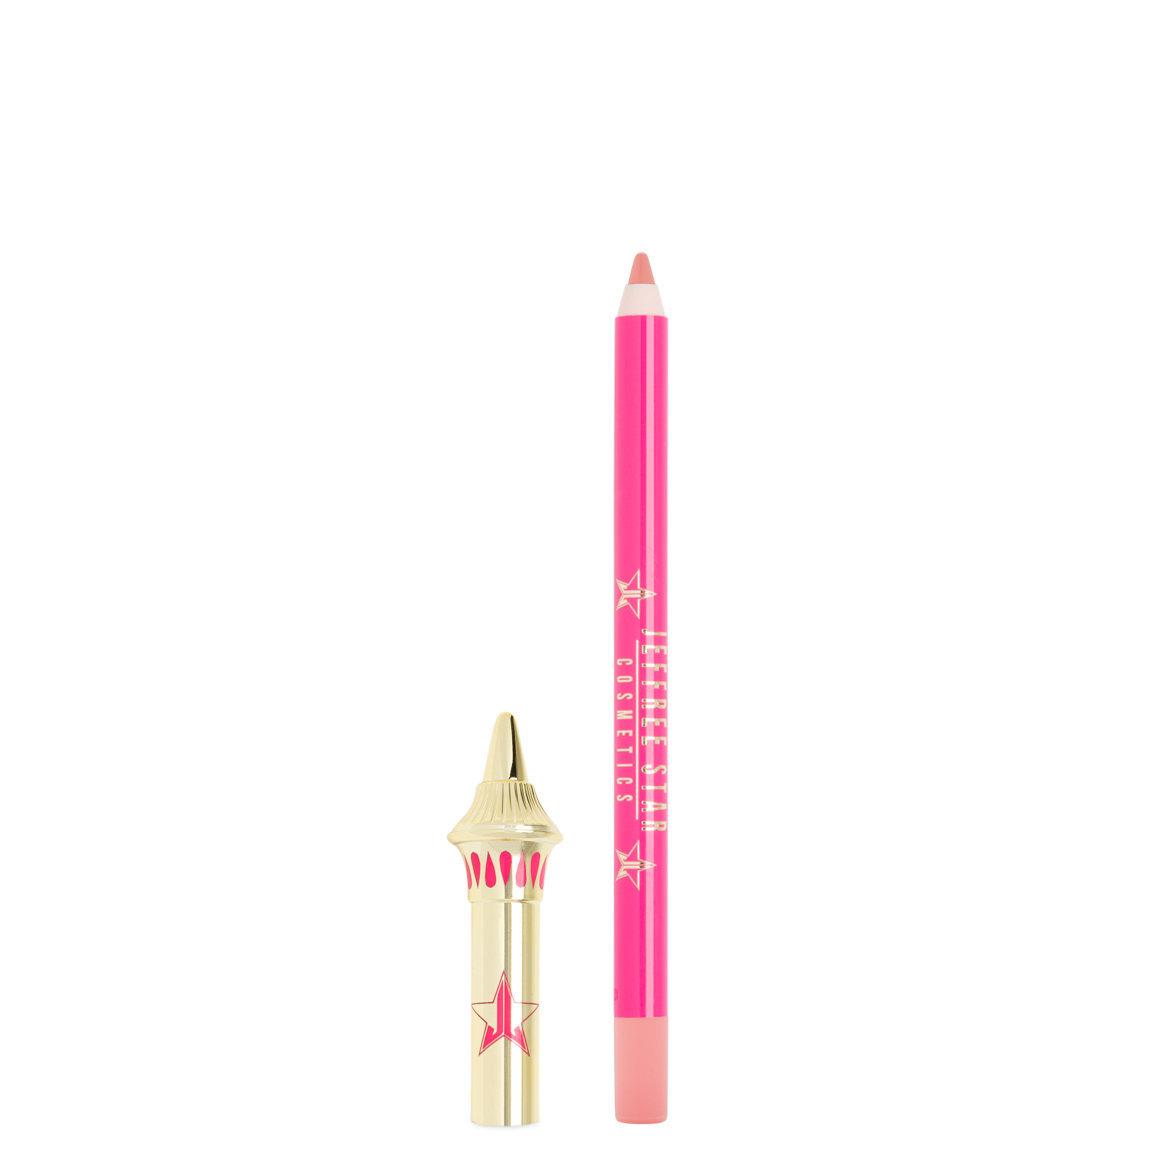 Jeffree Star Cosmetics Velour Lip Liner Skin Tight alternative view 1.